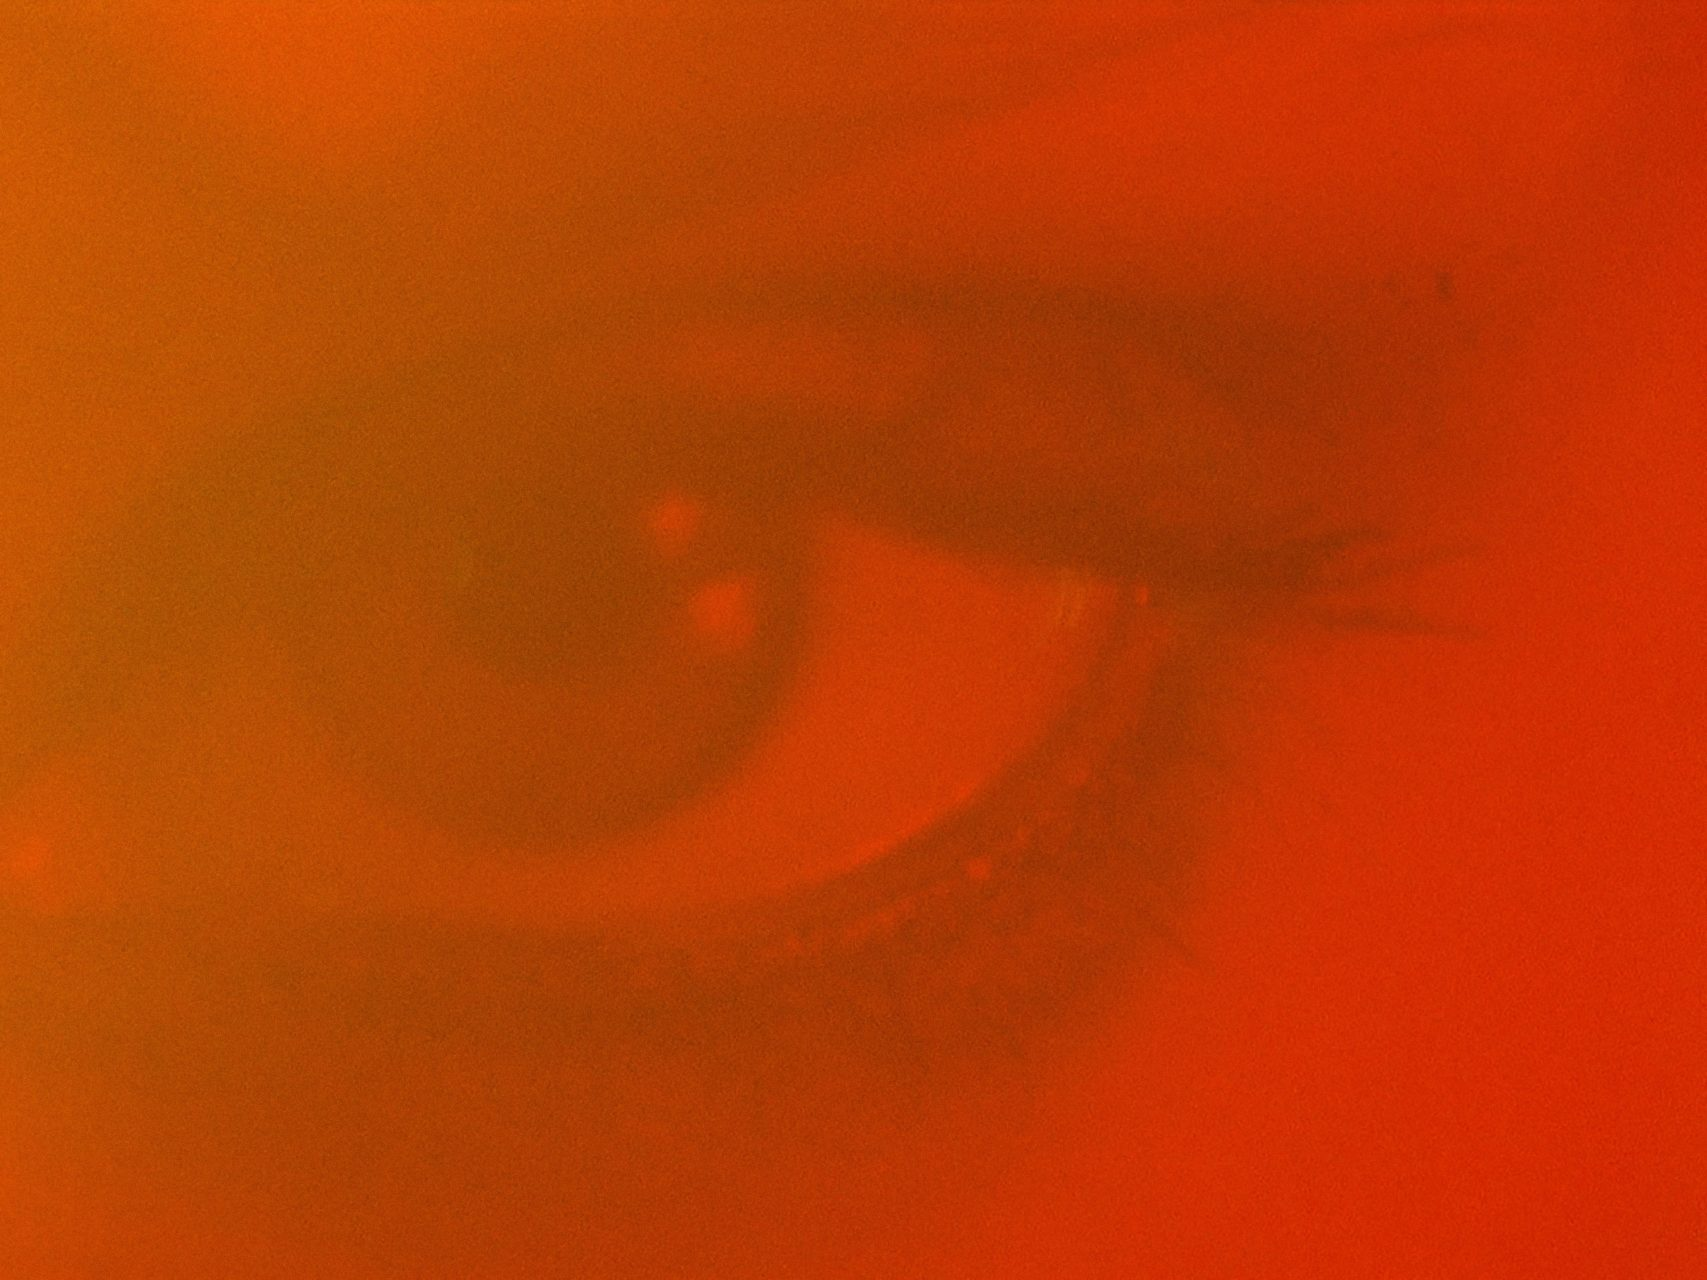 MONTAGE_01_GRUNGE_SANS_BARRES.00_00_27_07.Image fixe050